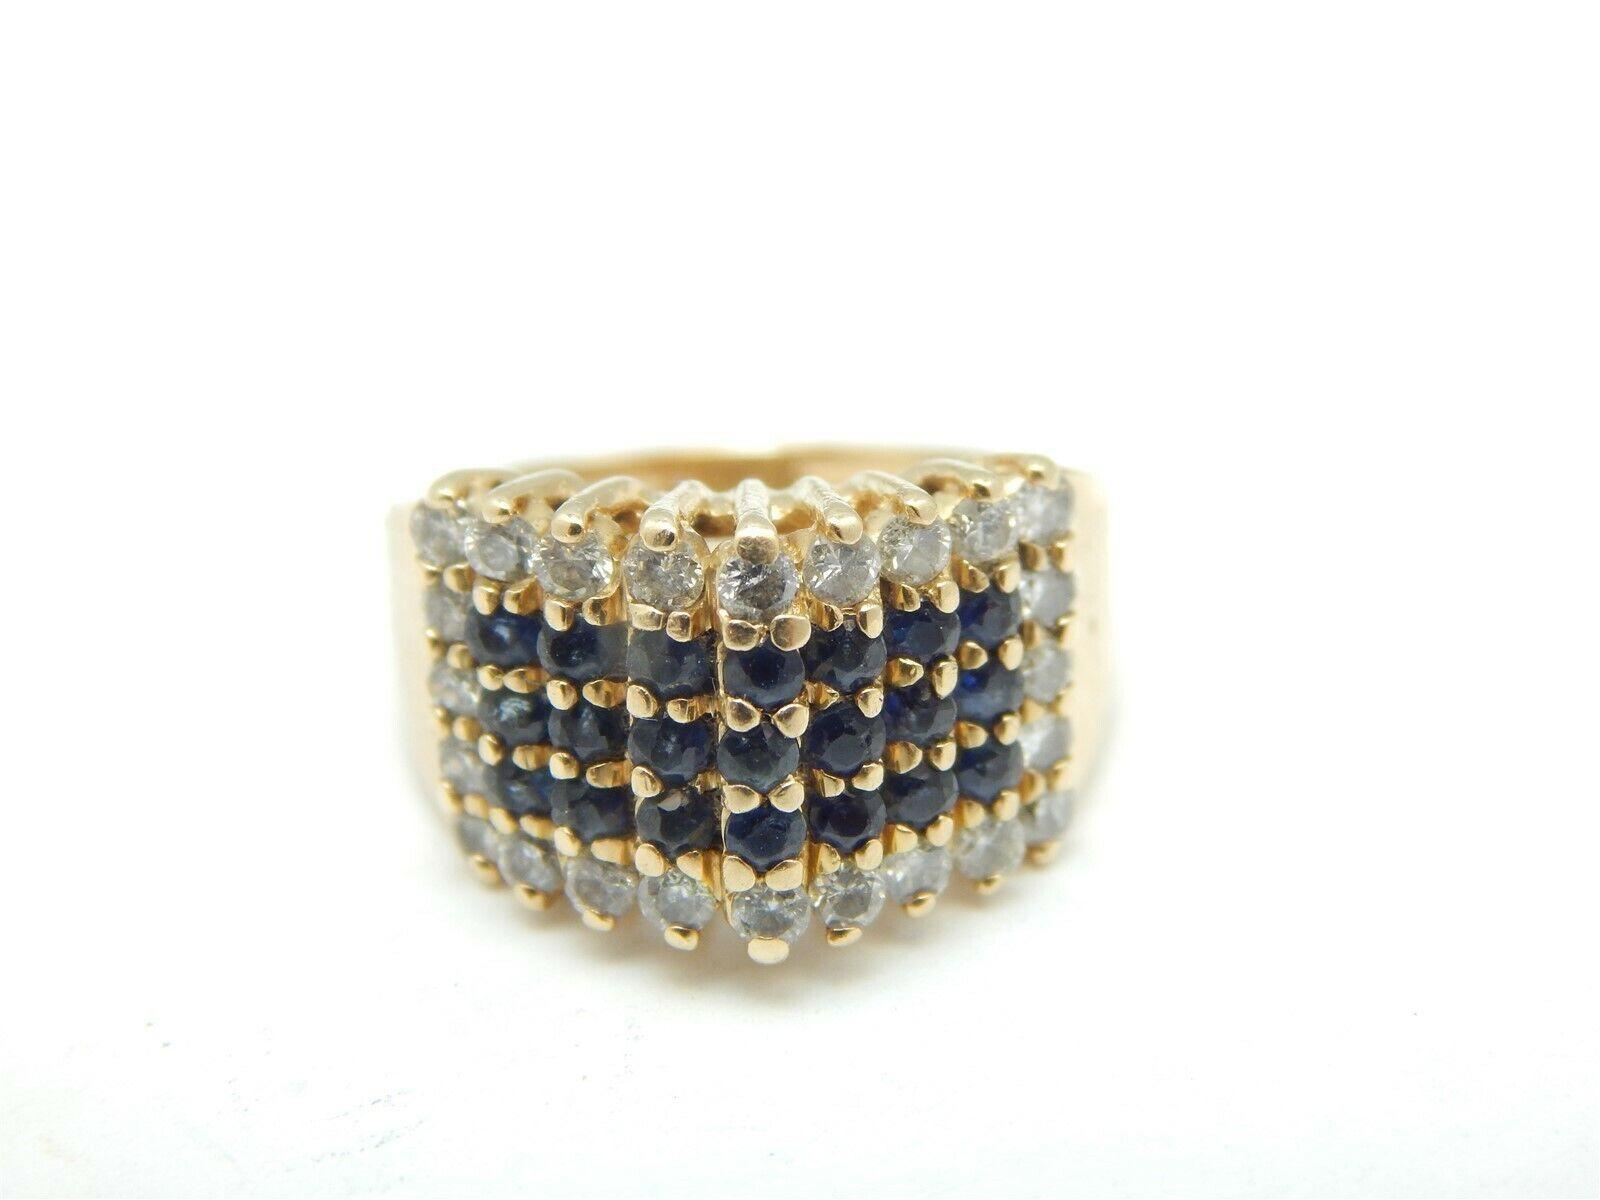 14K YELLOW gold 1 TCW SAPPHIRES & DIAMOND PYRAMID RING SIZE 3.75